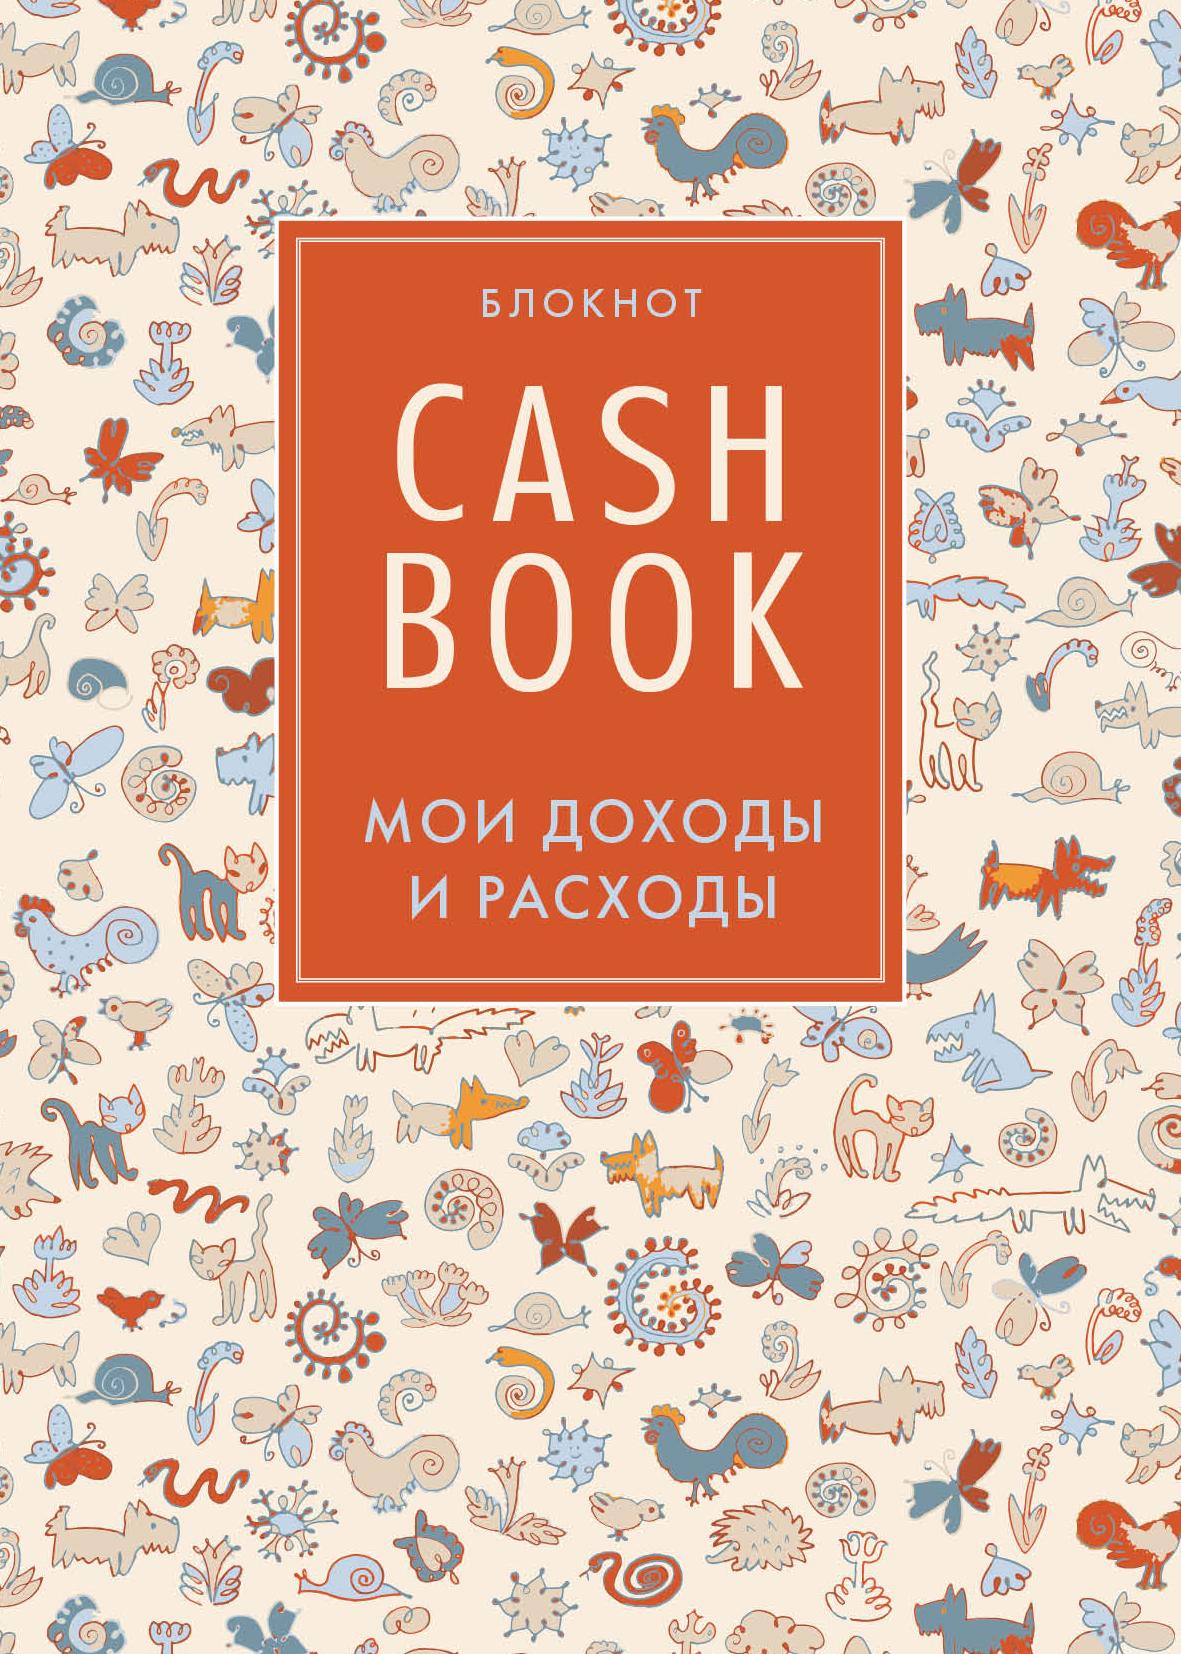 CashBook. Мои доходы и расходы. 3-е издание (3 оформление) cashbook мои доходы и расходы 4 е изд 3 е оф